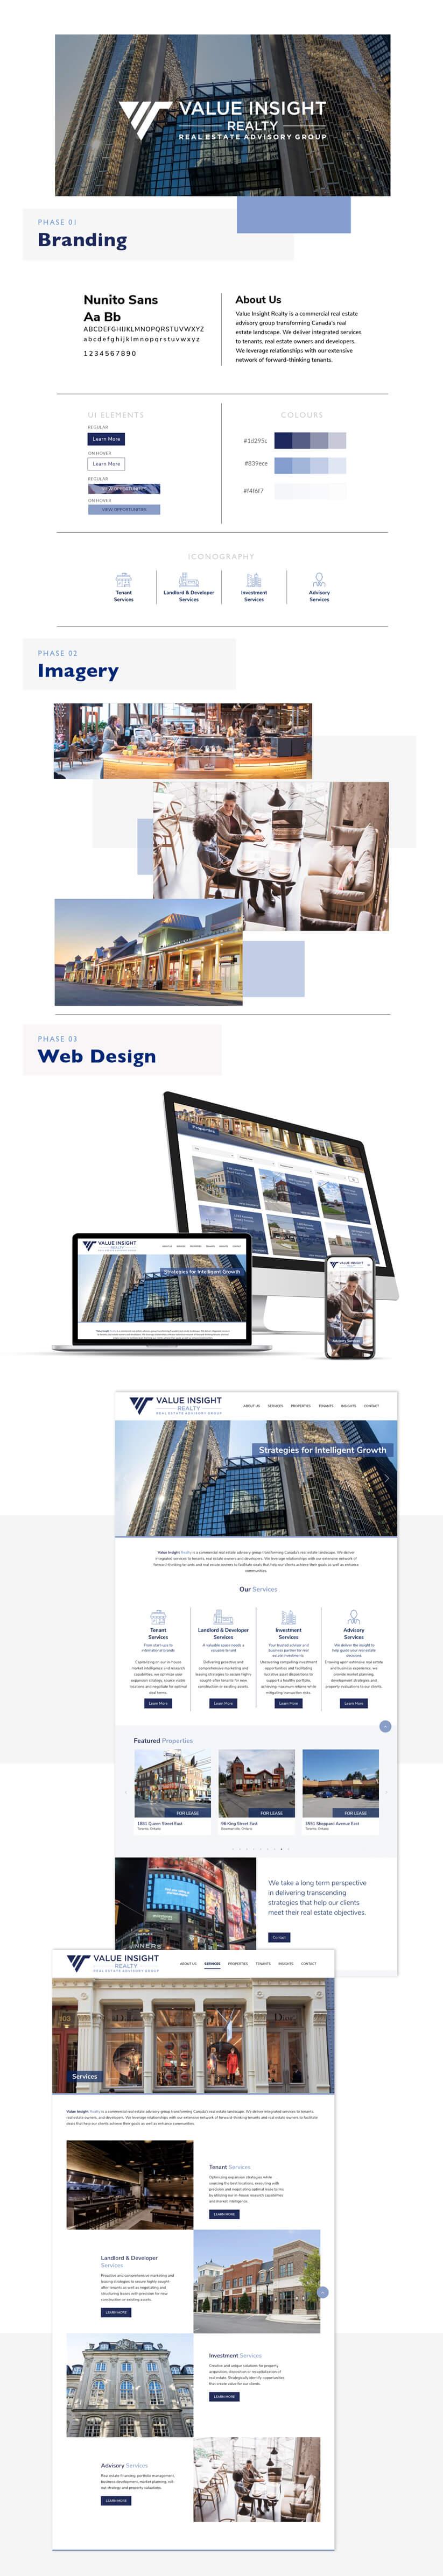 Value-Insight-Realty-Portfolio-Page